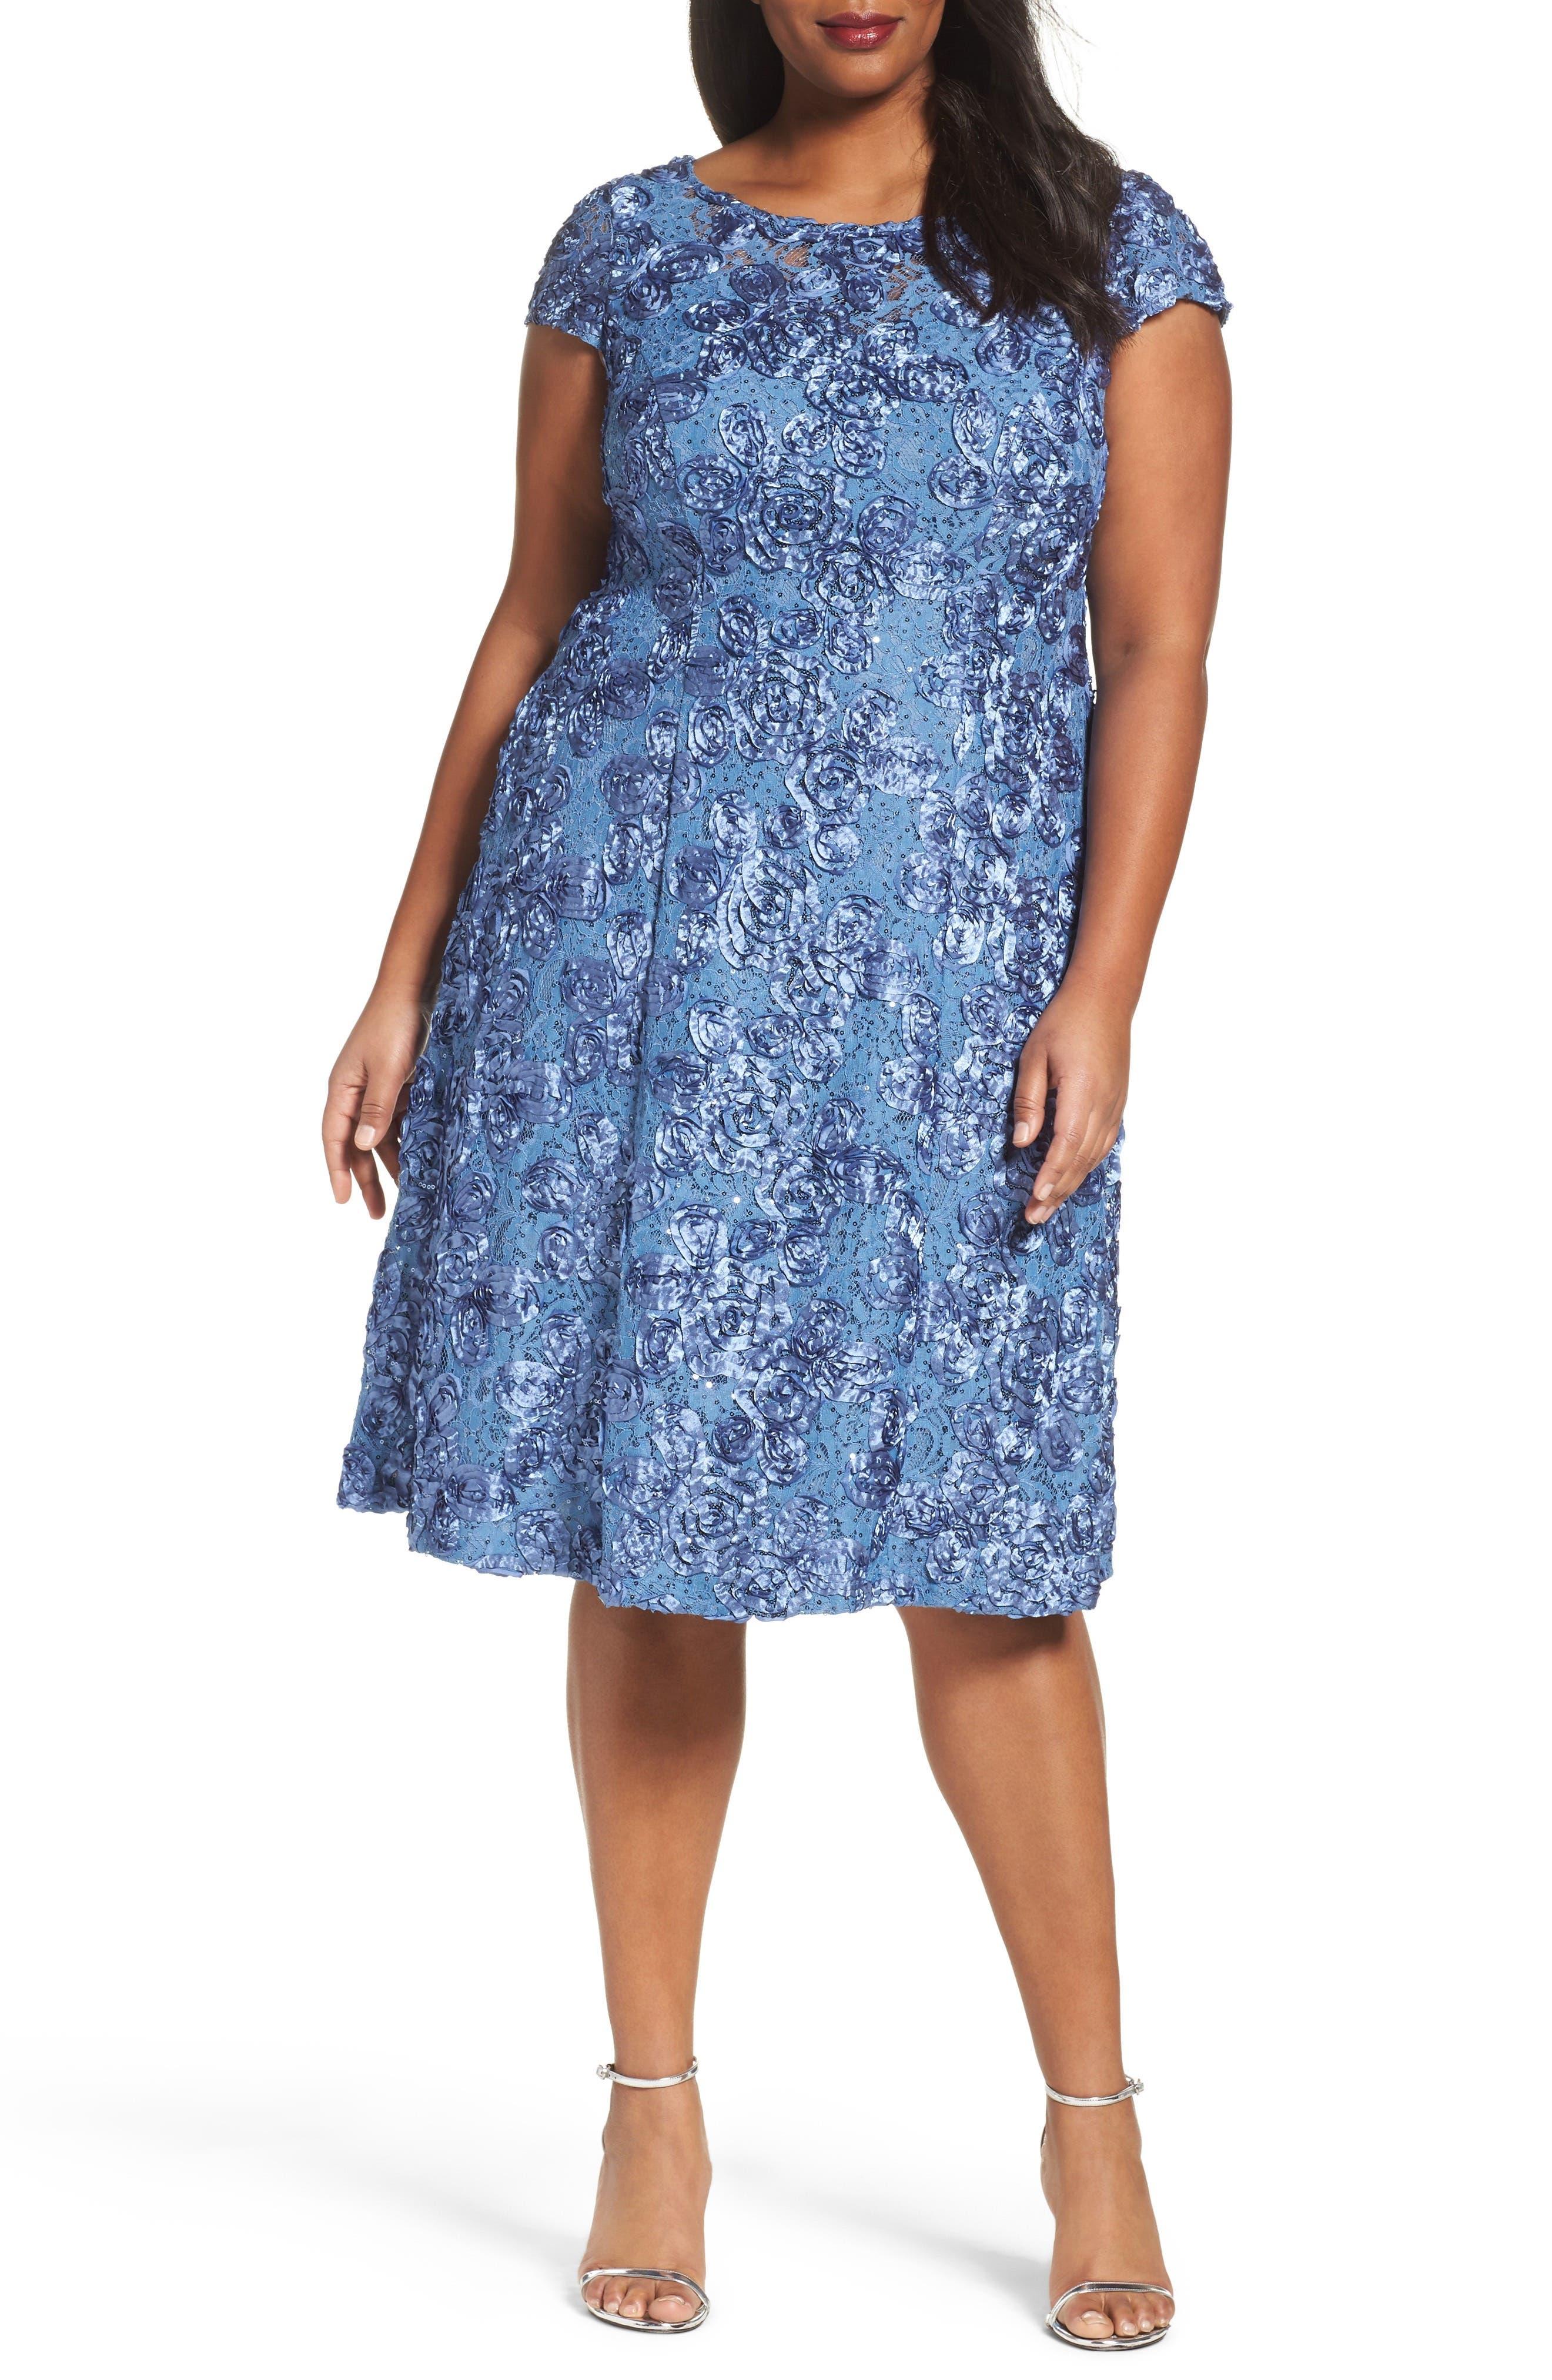 Alternate Image 1 Selected - Alex Evenings Rosette Fit & Flare Dress (Plus Size)